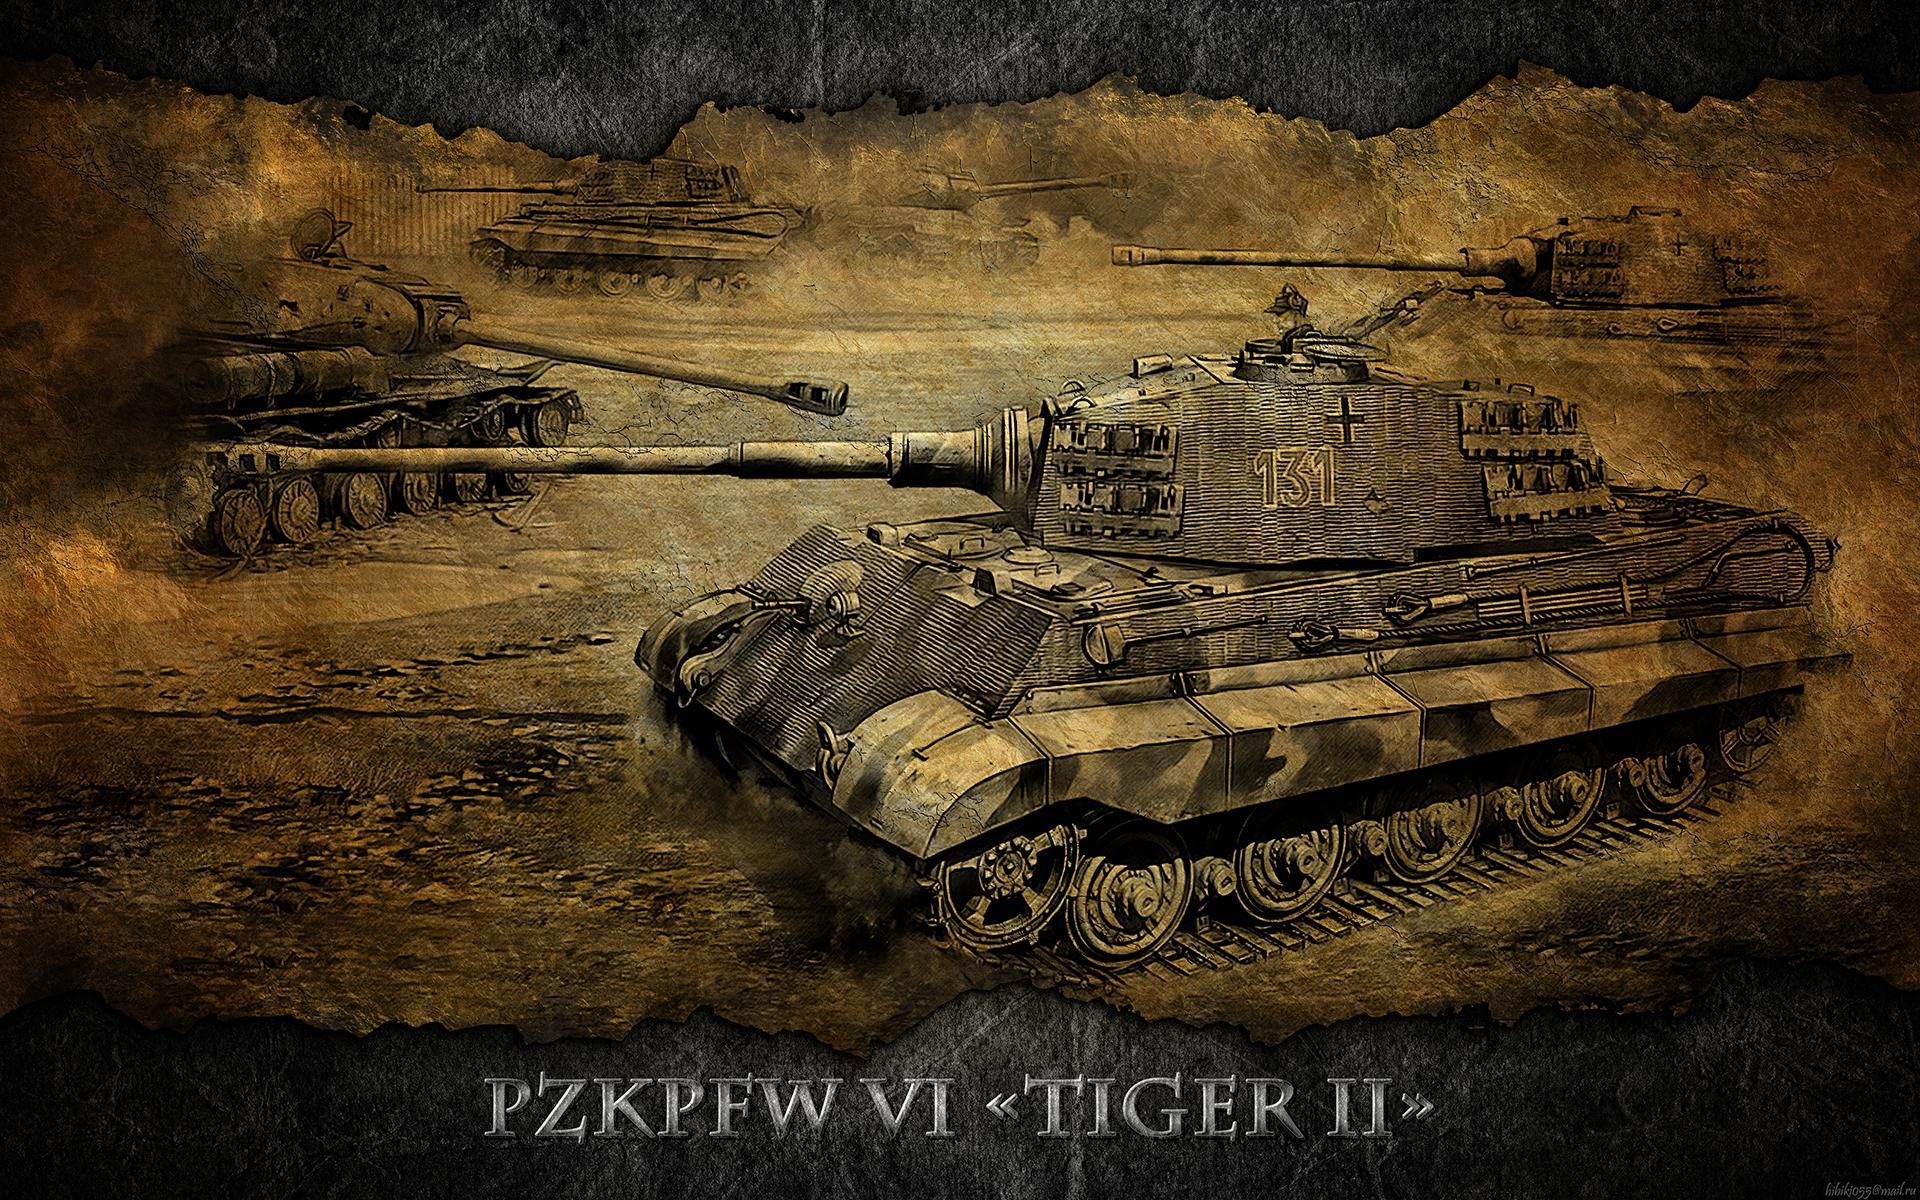 World Of Tanks Tanks Pzkpfw Vib Tiger Ii Games Wallpaper King